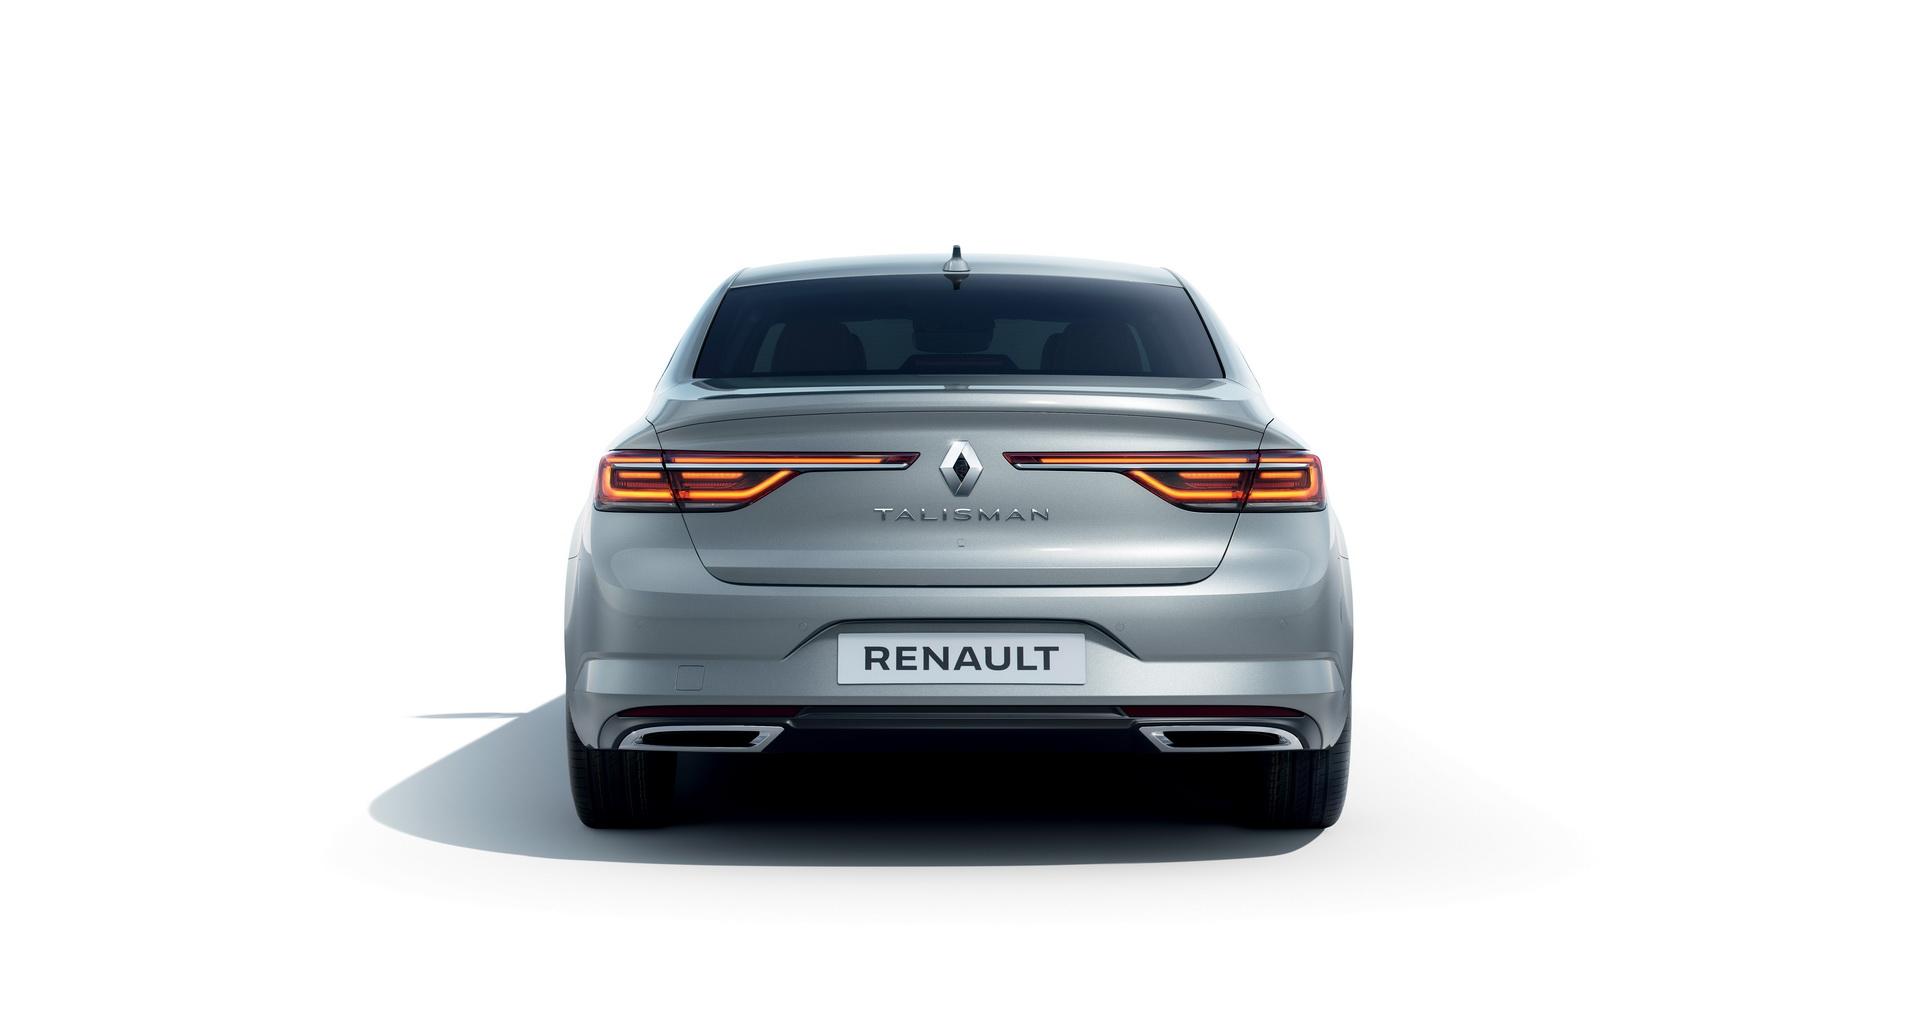 Renault-Talisman-facelift-2020-15